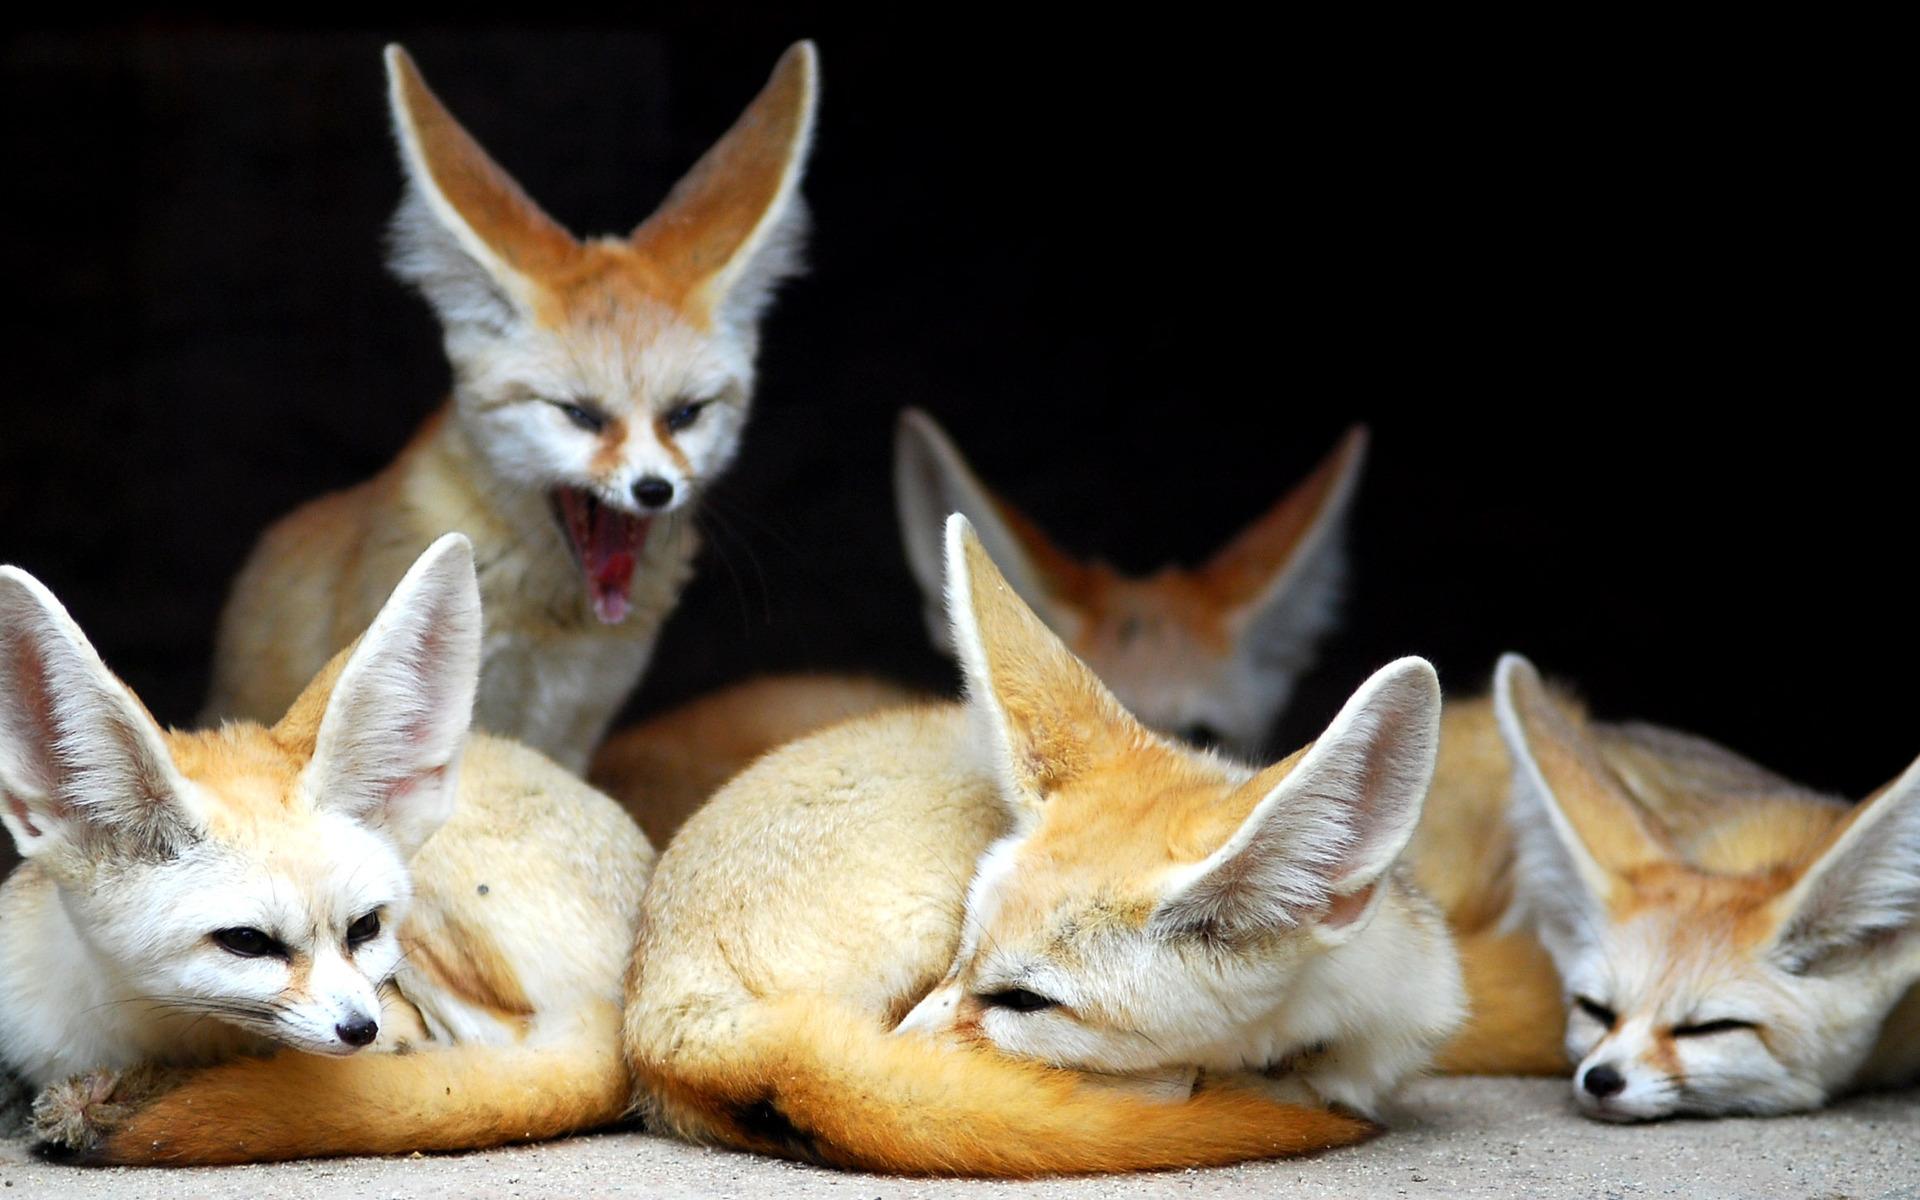 Cute Fennec Fox Wallpaper 35932 1600x900 px ~ HDWallSource.com